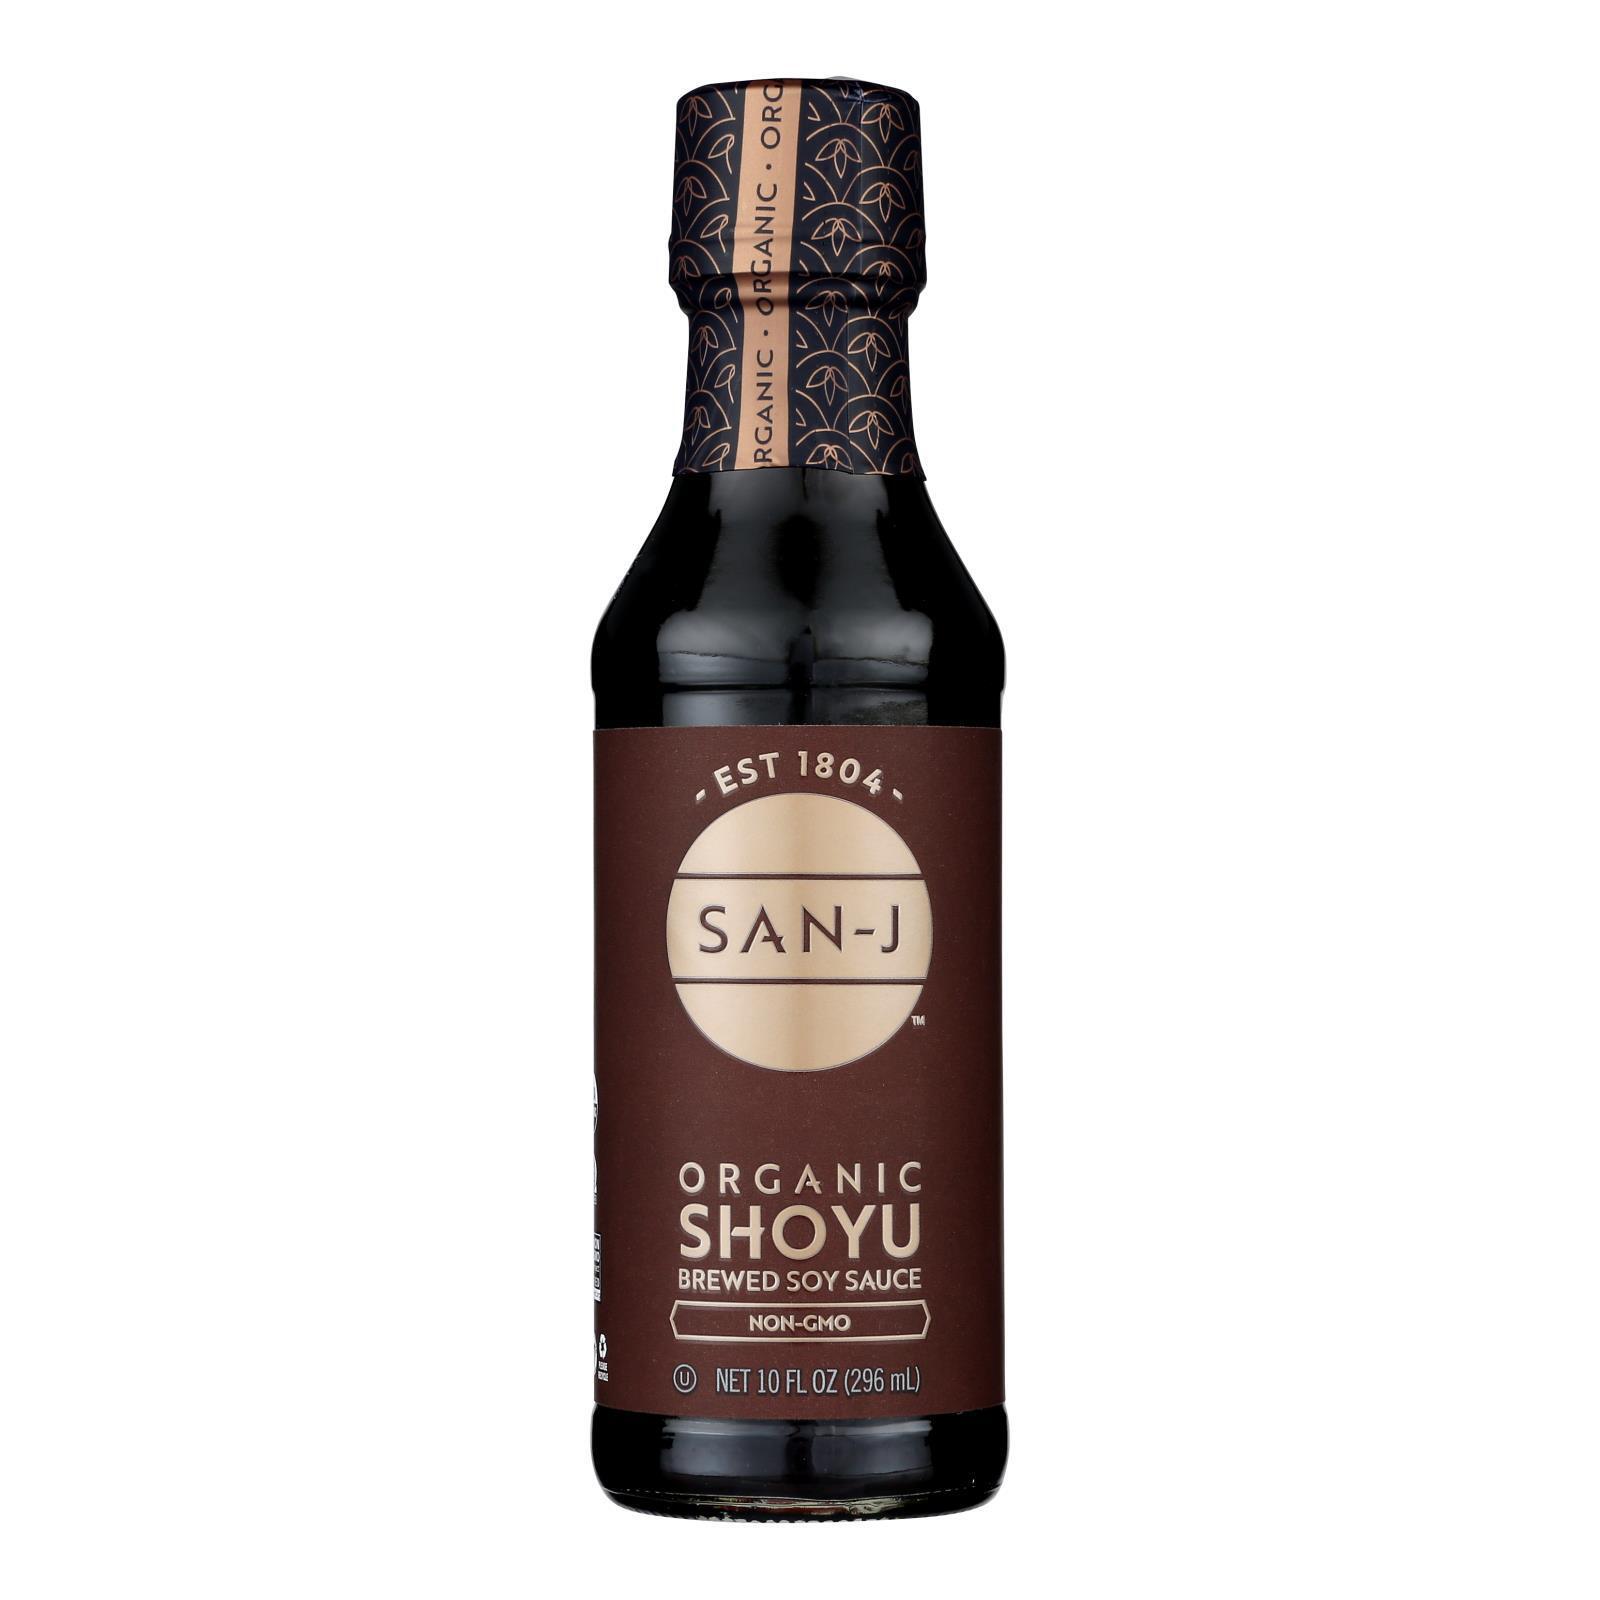 San - J Shoyu Soy Sauce - Organic - Case of 6 - 10 Fl oz.